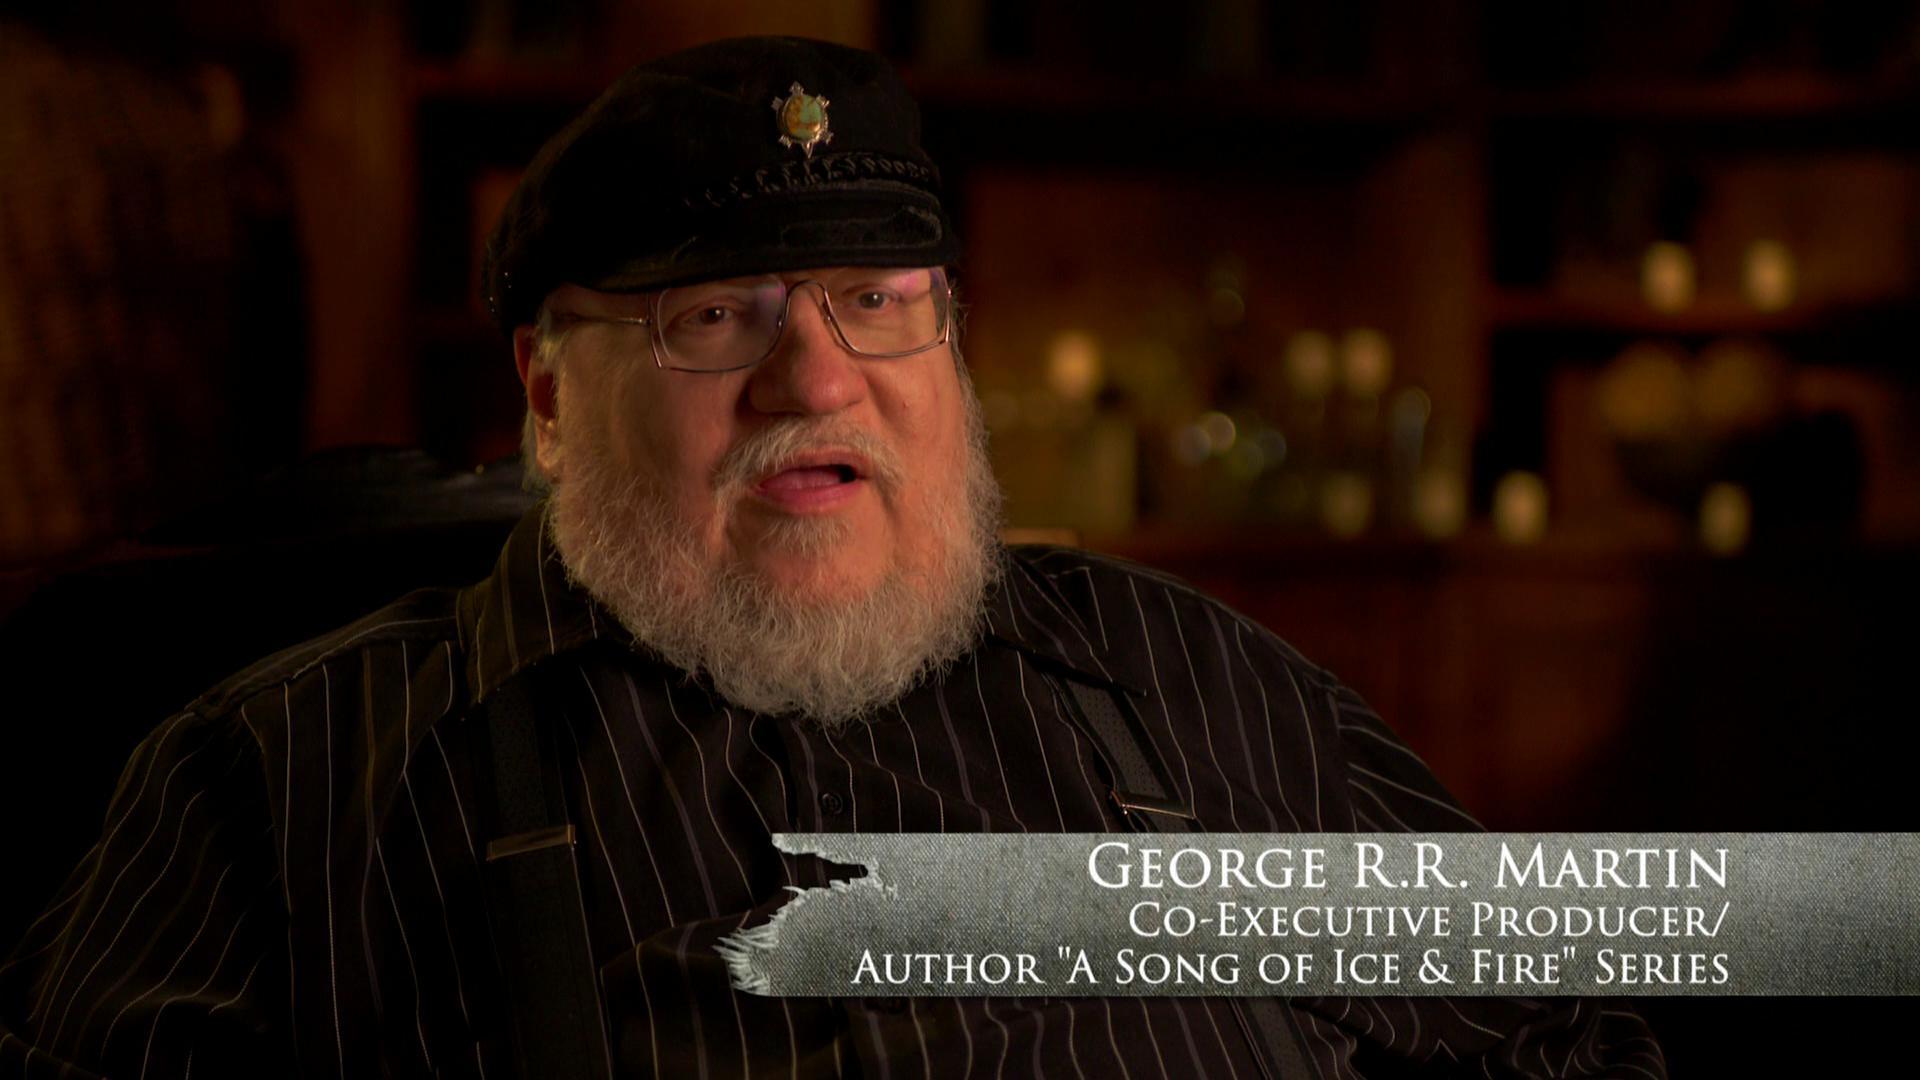 George rr martin bonus saison 5